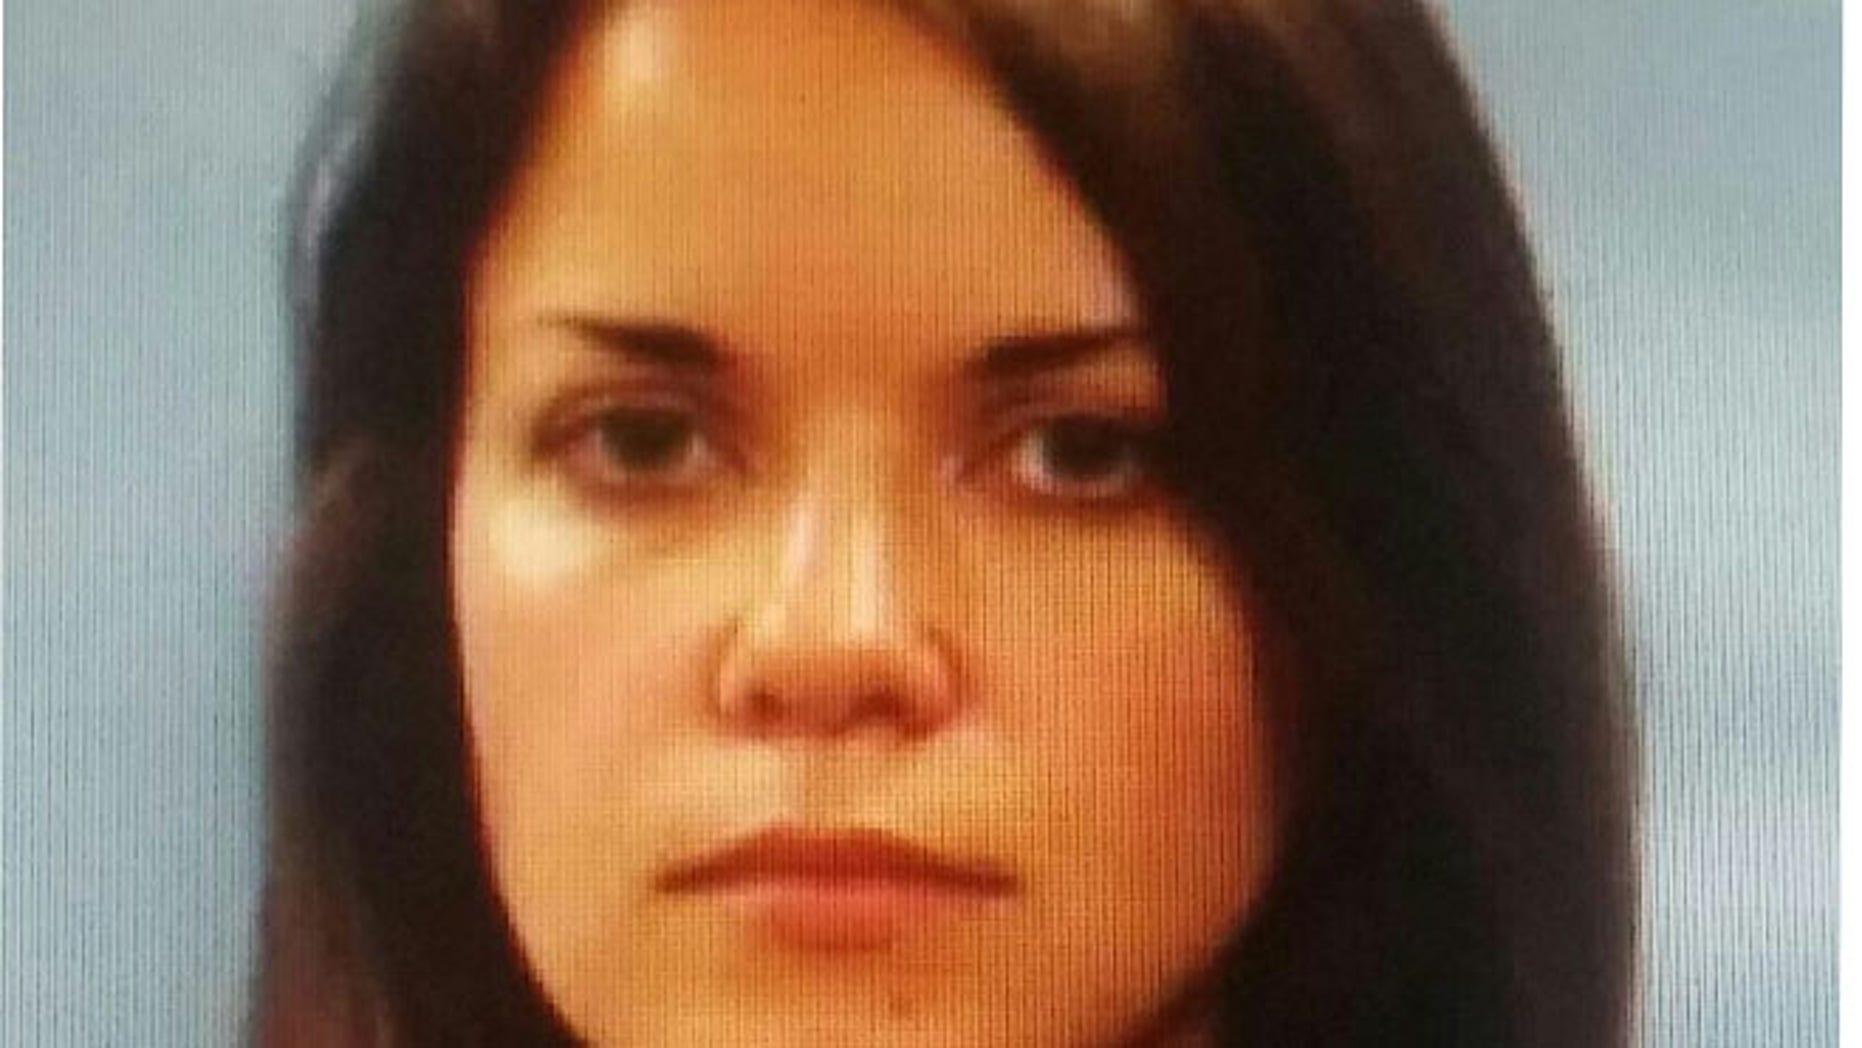 Laura Ann Buckingham booking photo. (Roane County Sheriff's Office)